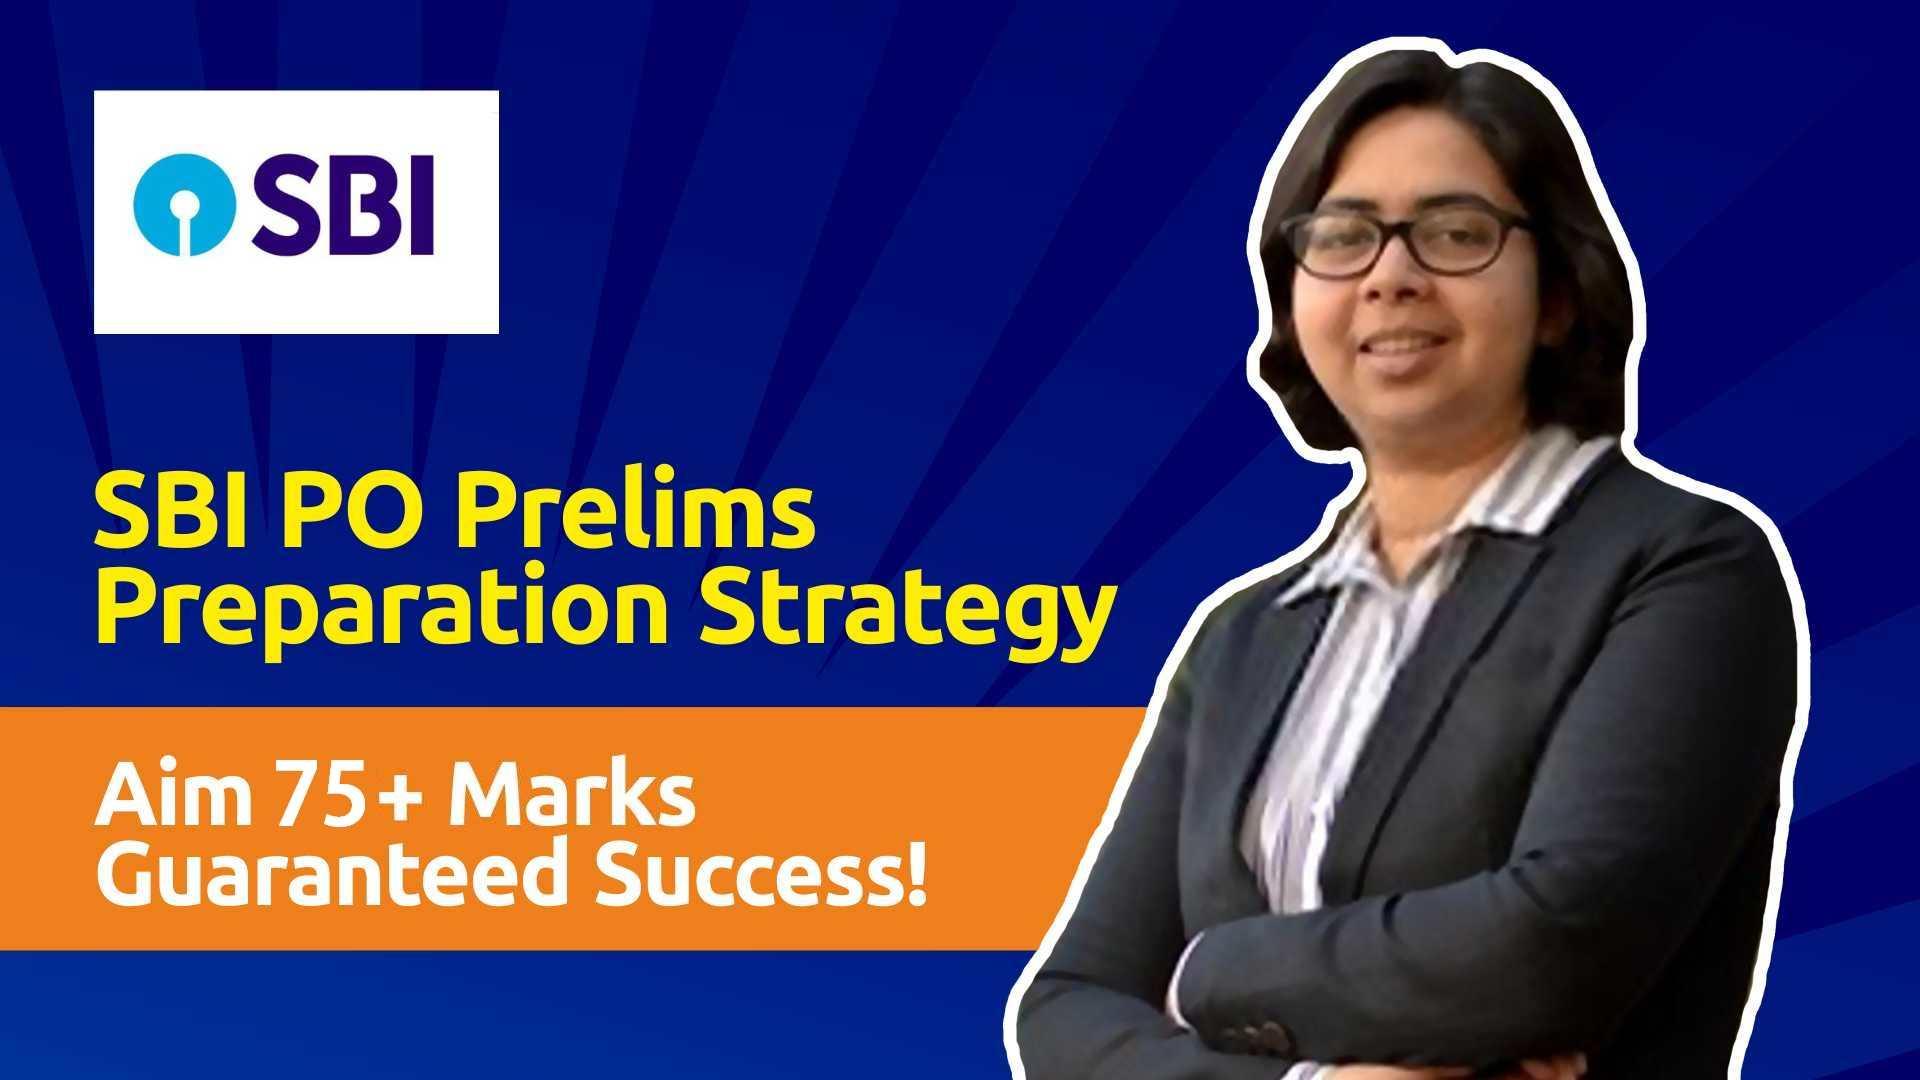 SBI PO Preparation Strategy